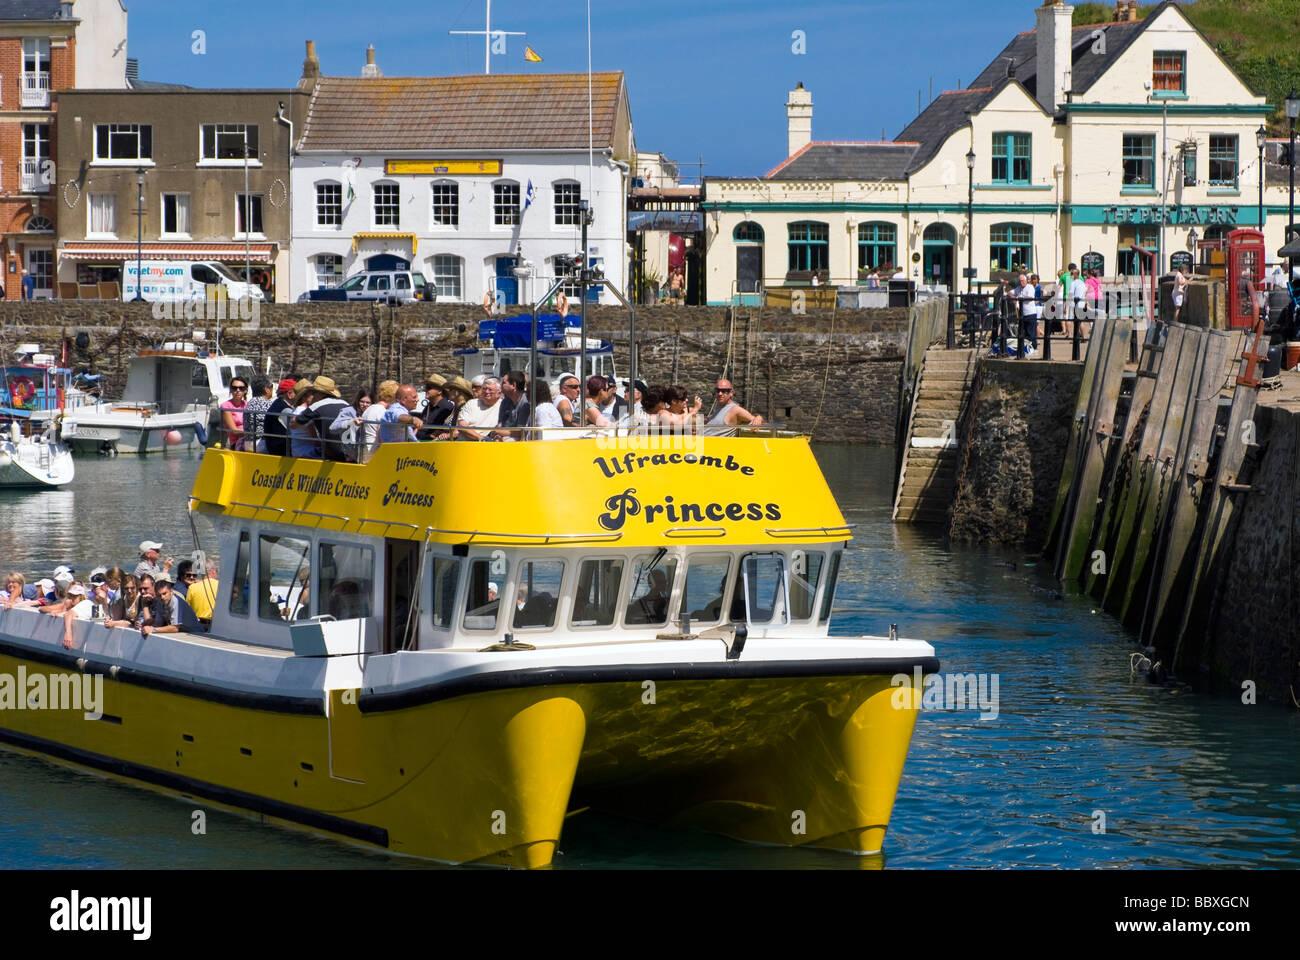 ilfracombe-princess-catamaran-boat-offering-coastal-wildlife-cruises-BBXGCN.jpg